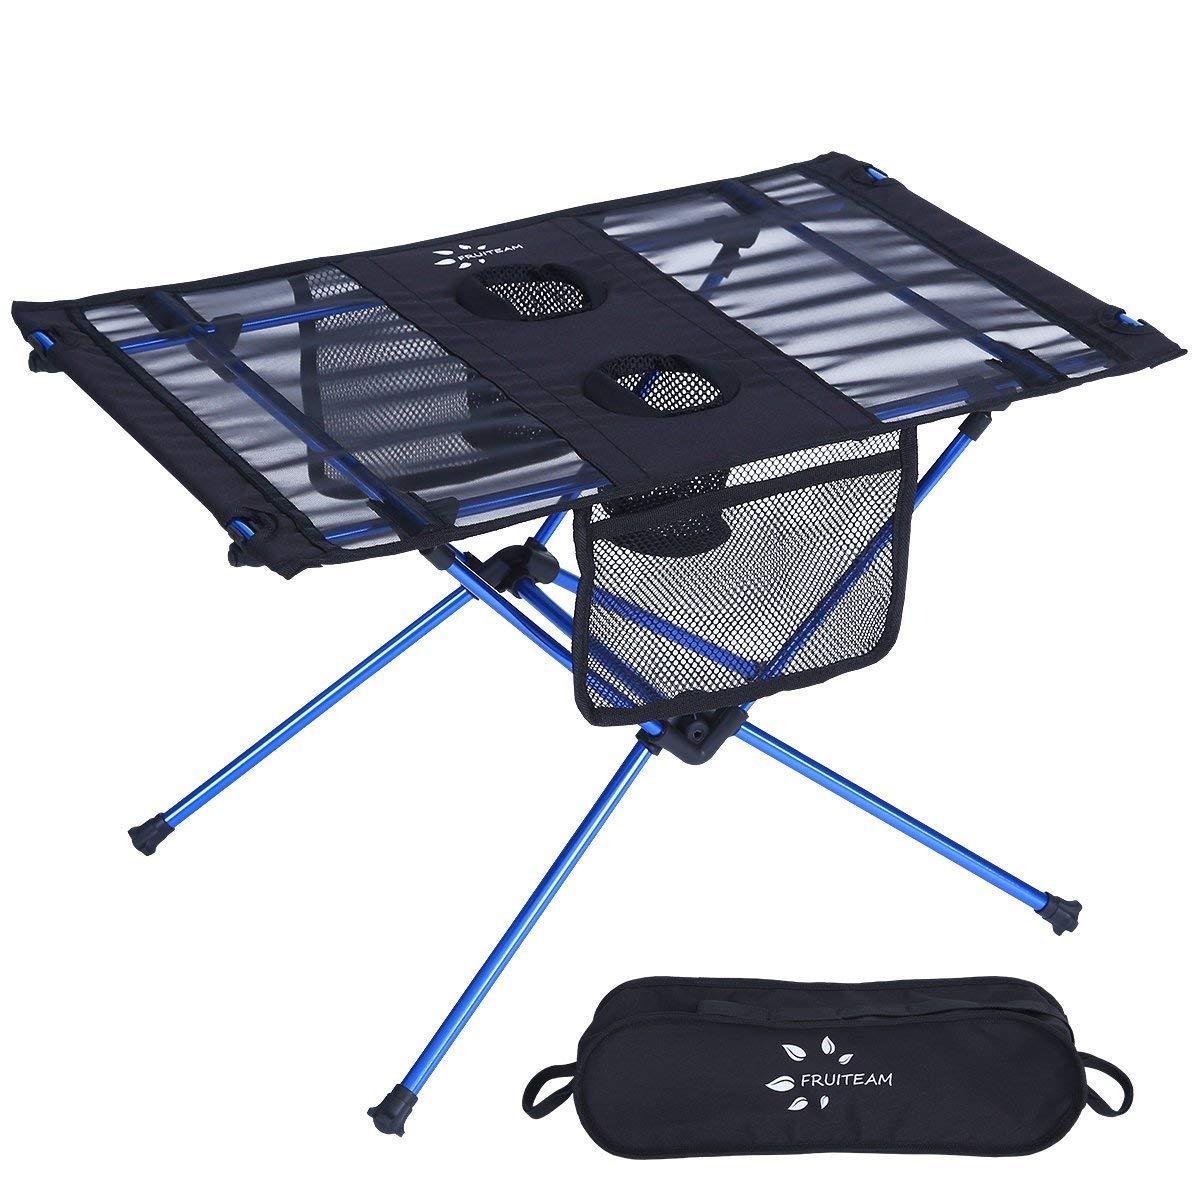 Fruiteam Portable Camp Walmart Folding Beach Table